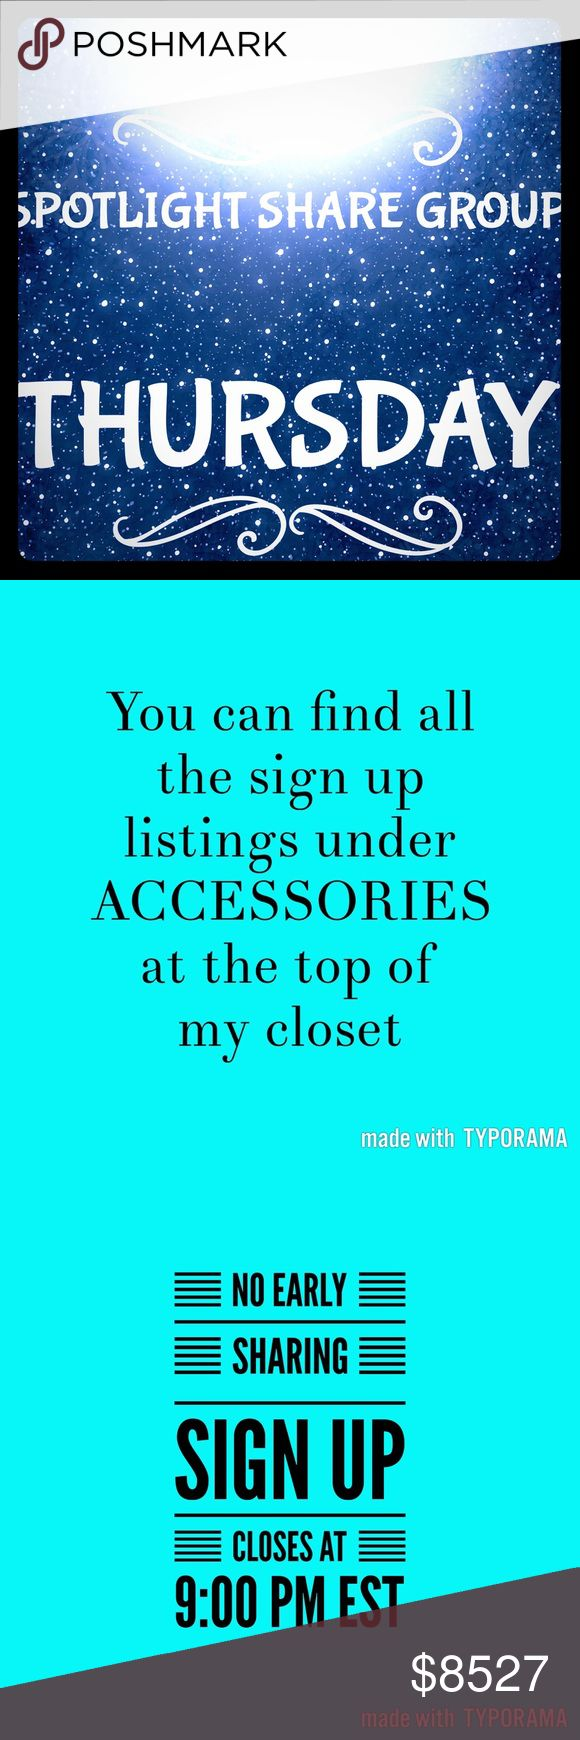 394 best My Posh Closet images on Pinterest